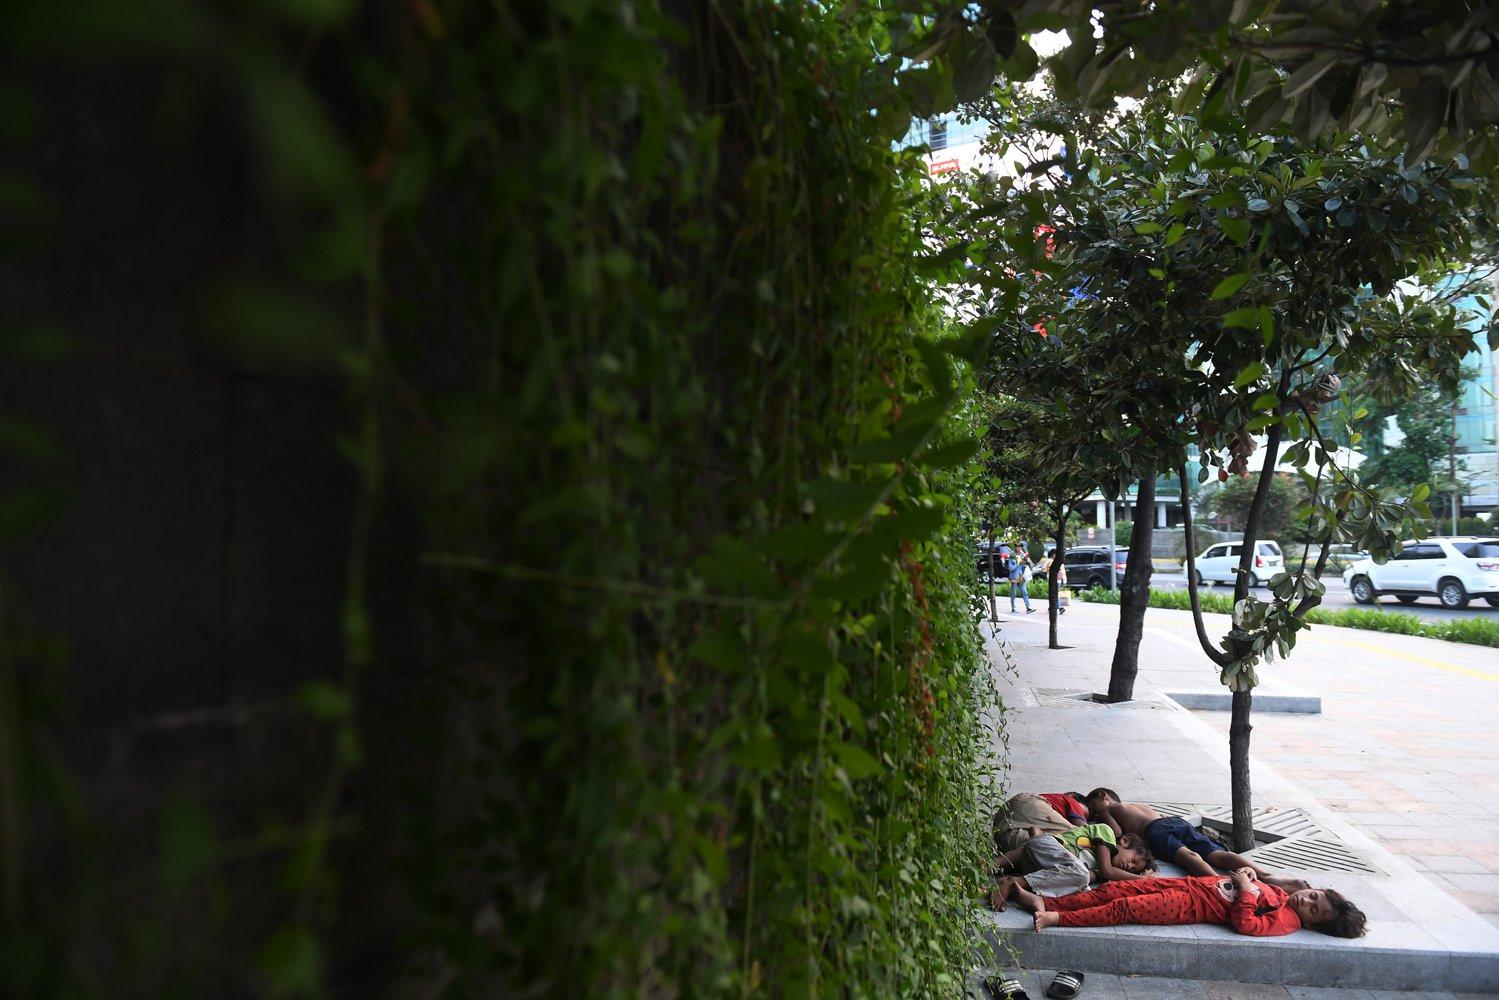 Sejumlah anak tertidur di trotoar kawasan Bundaran HI, Jakarta, Minggu (8/12/2019). Anak-anak yang tumbuh besar di jalanan tanpa pengawasan rentan terseret ke dunia kriminalitas hingga menjadi korban kekerasan fisik maupun seksual.